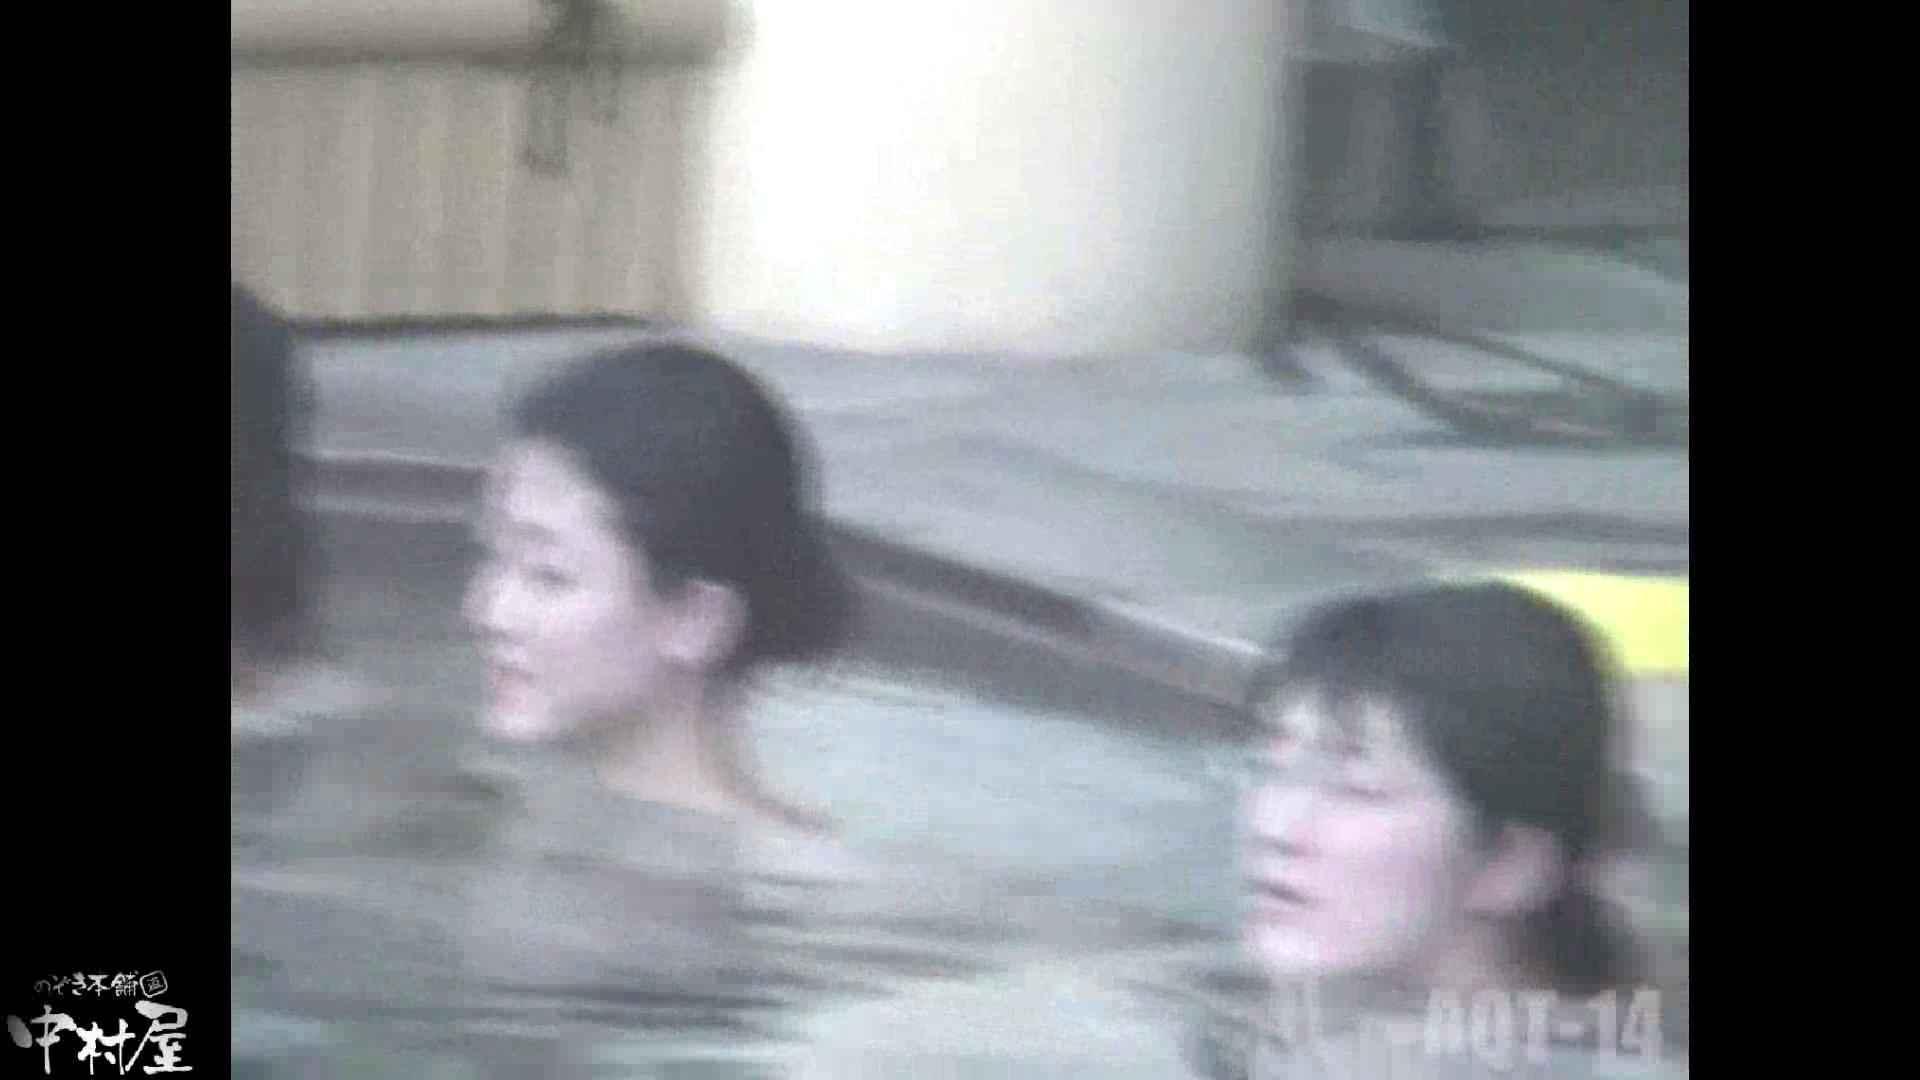 Aquaな露天風呂Vol.878潜入盗撮露天風呂十四判湯 其の十 盗撮 | 露天  75枚 13